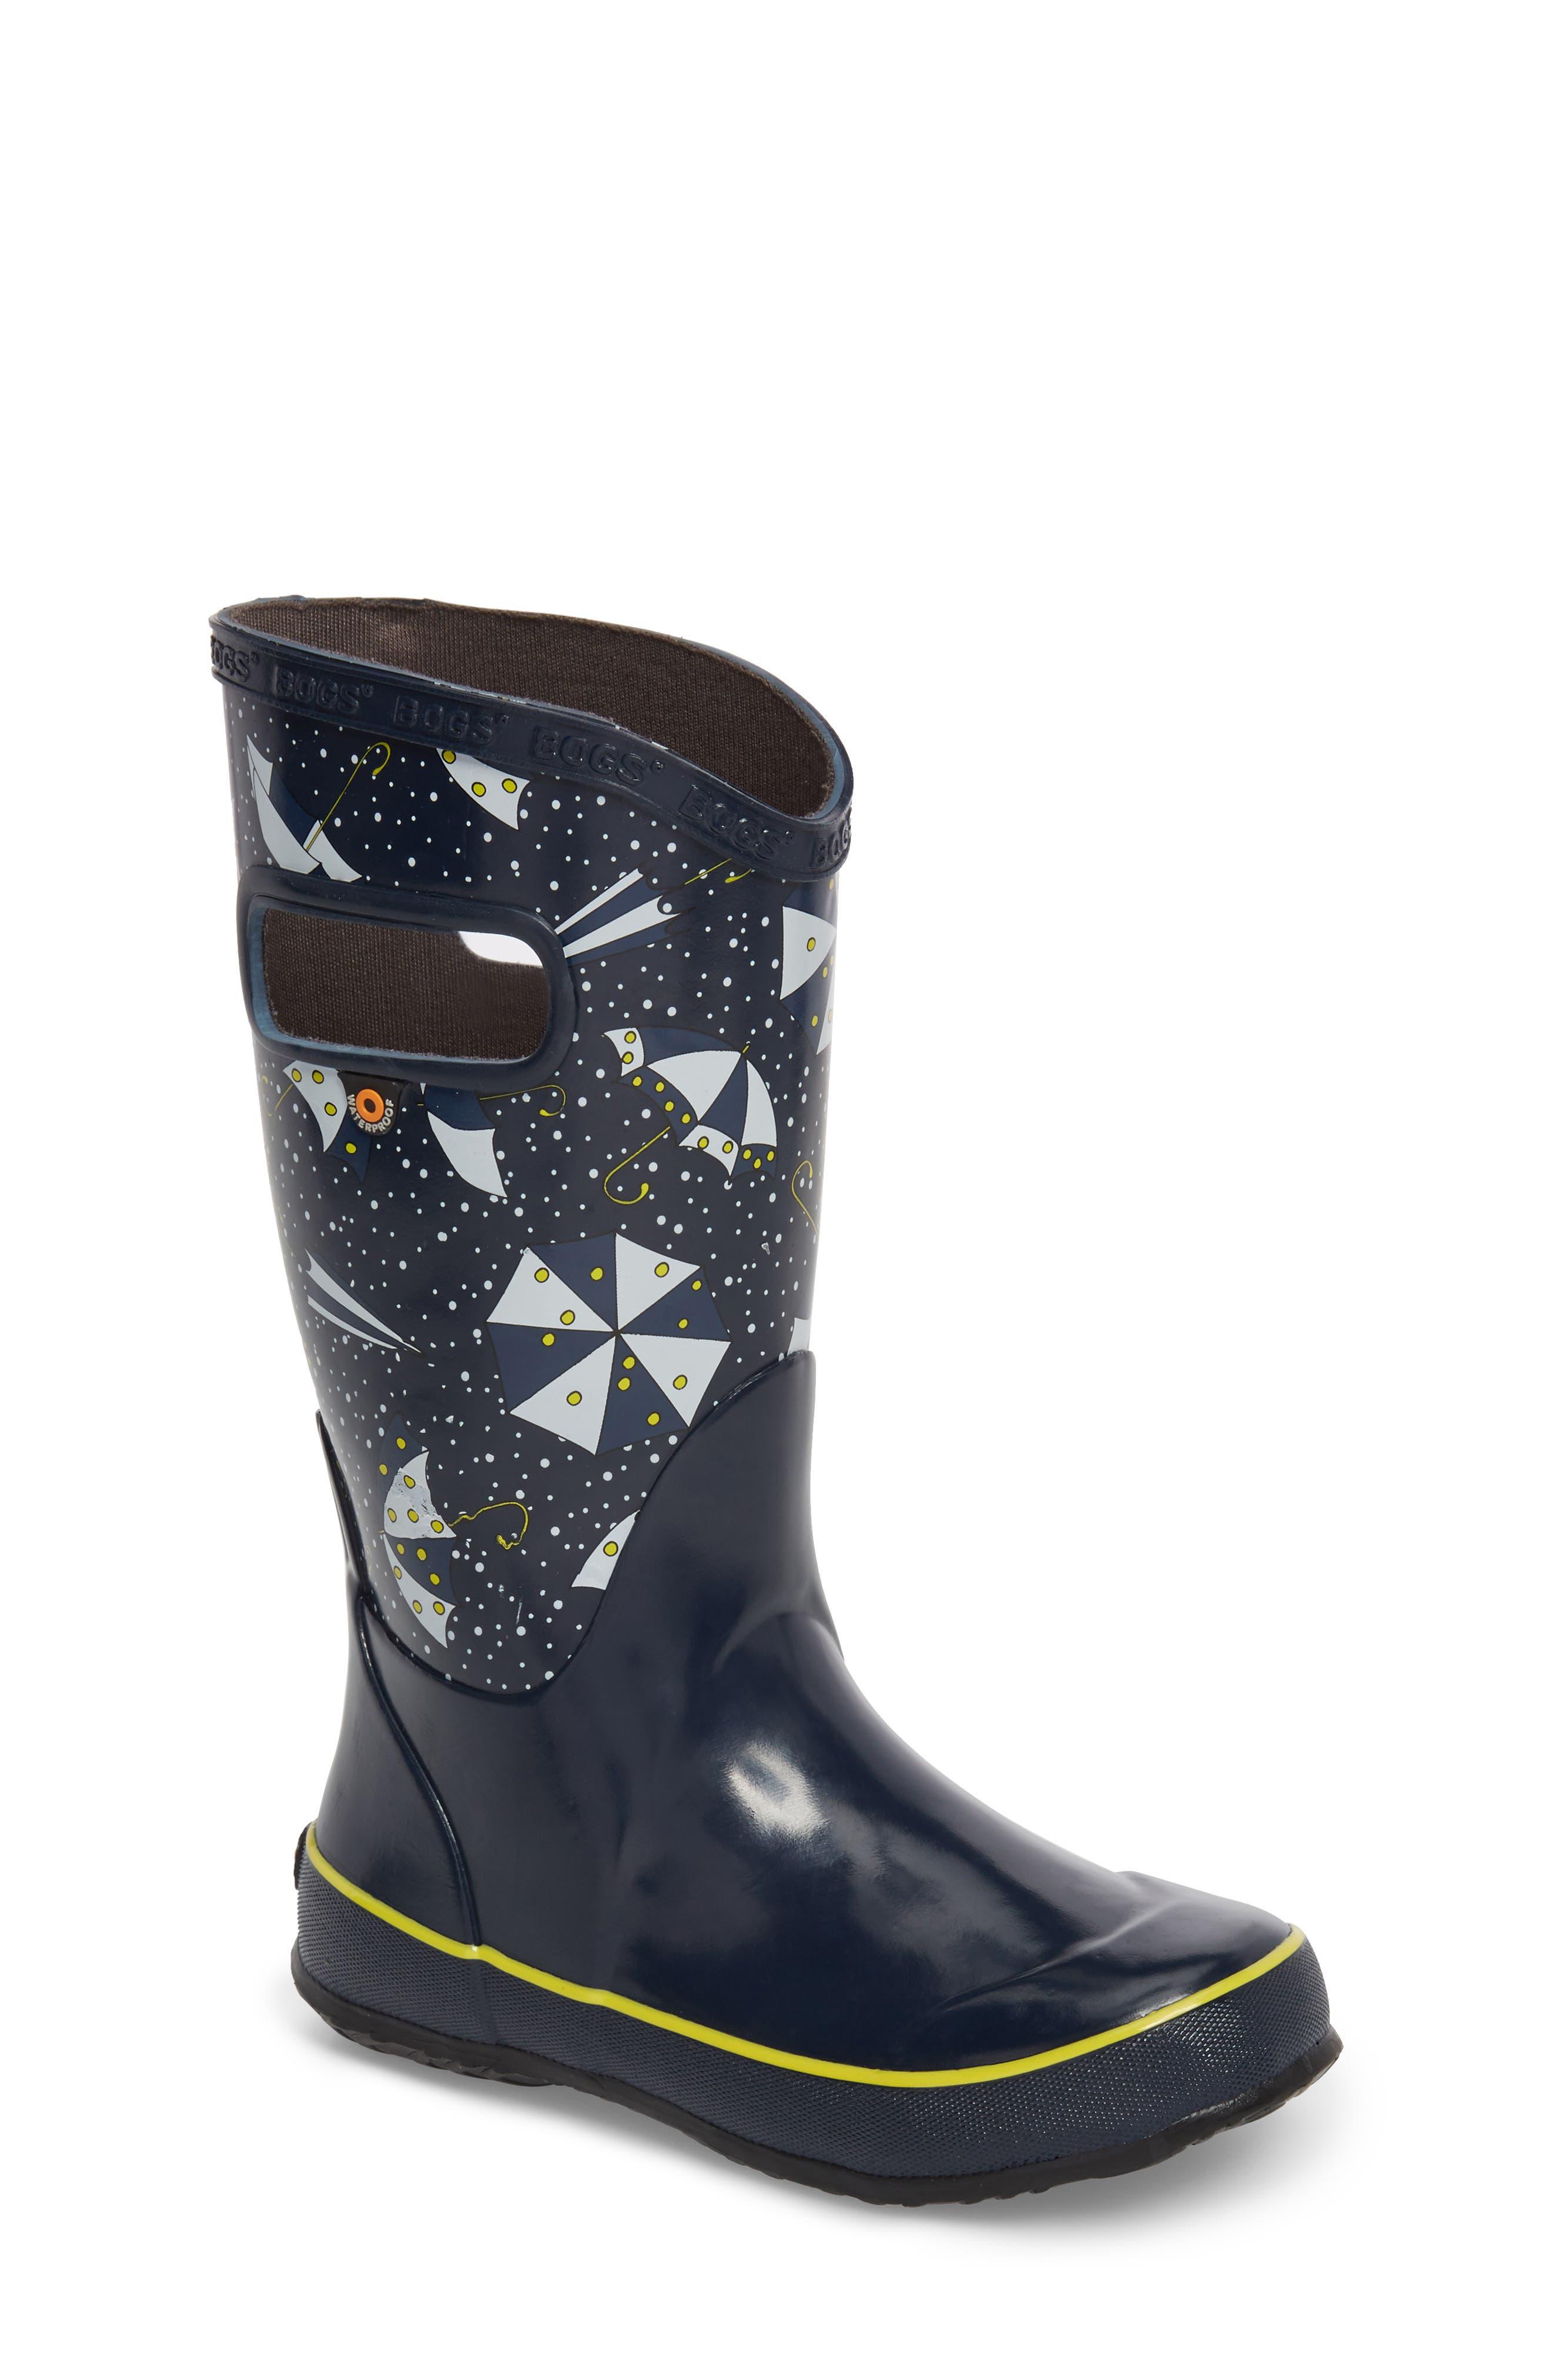 Umbrellas Waterproof Rubber Rain Boot,                         Main,                         color, Dark Blue Multi